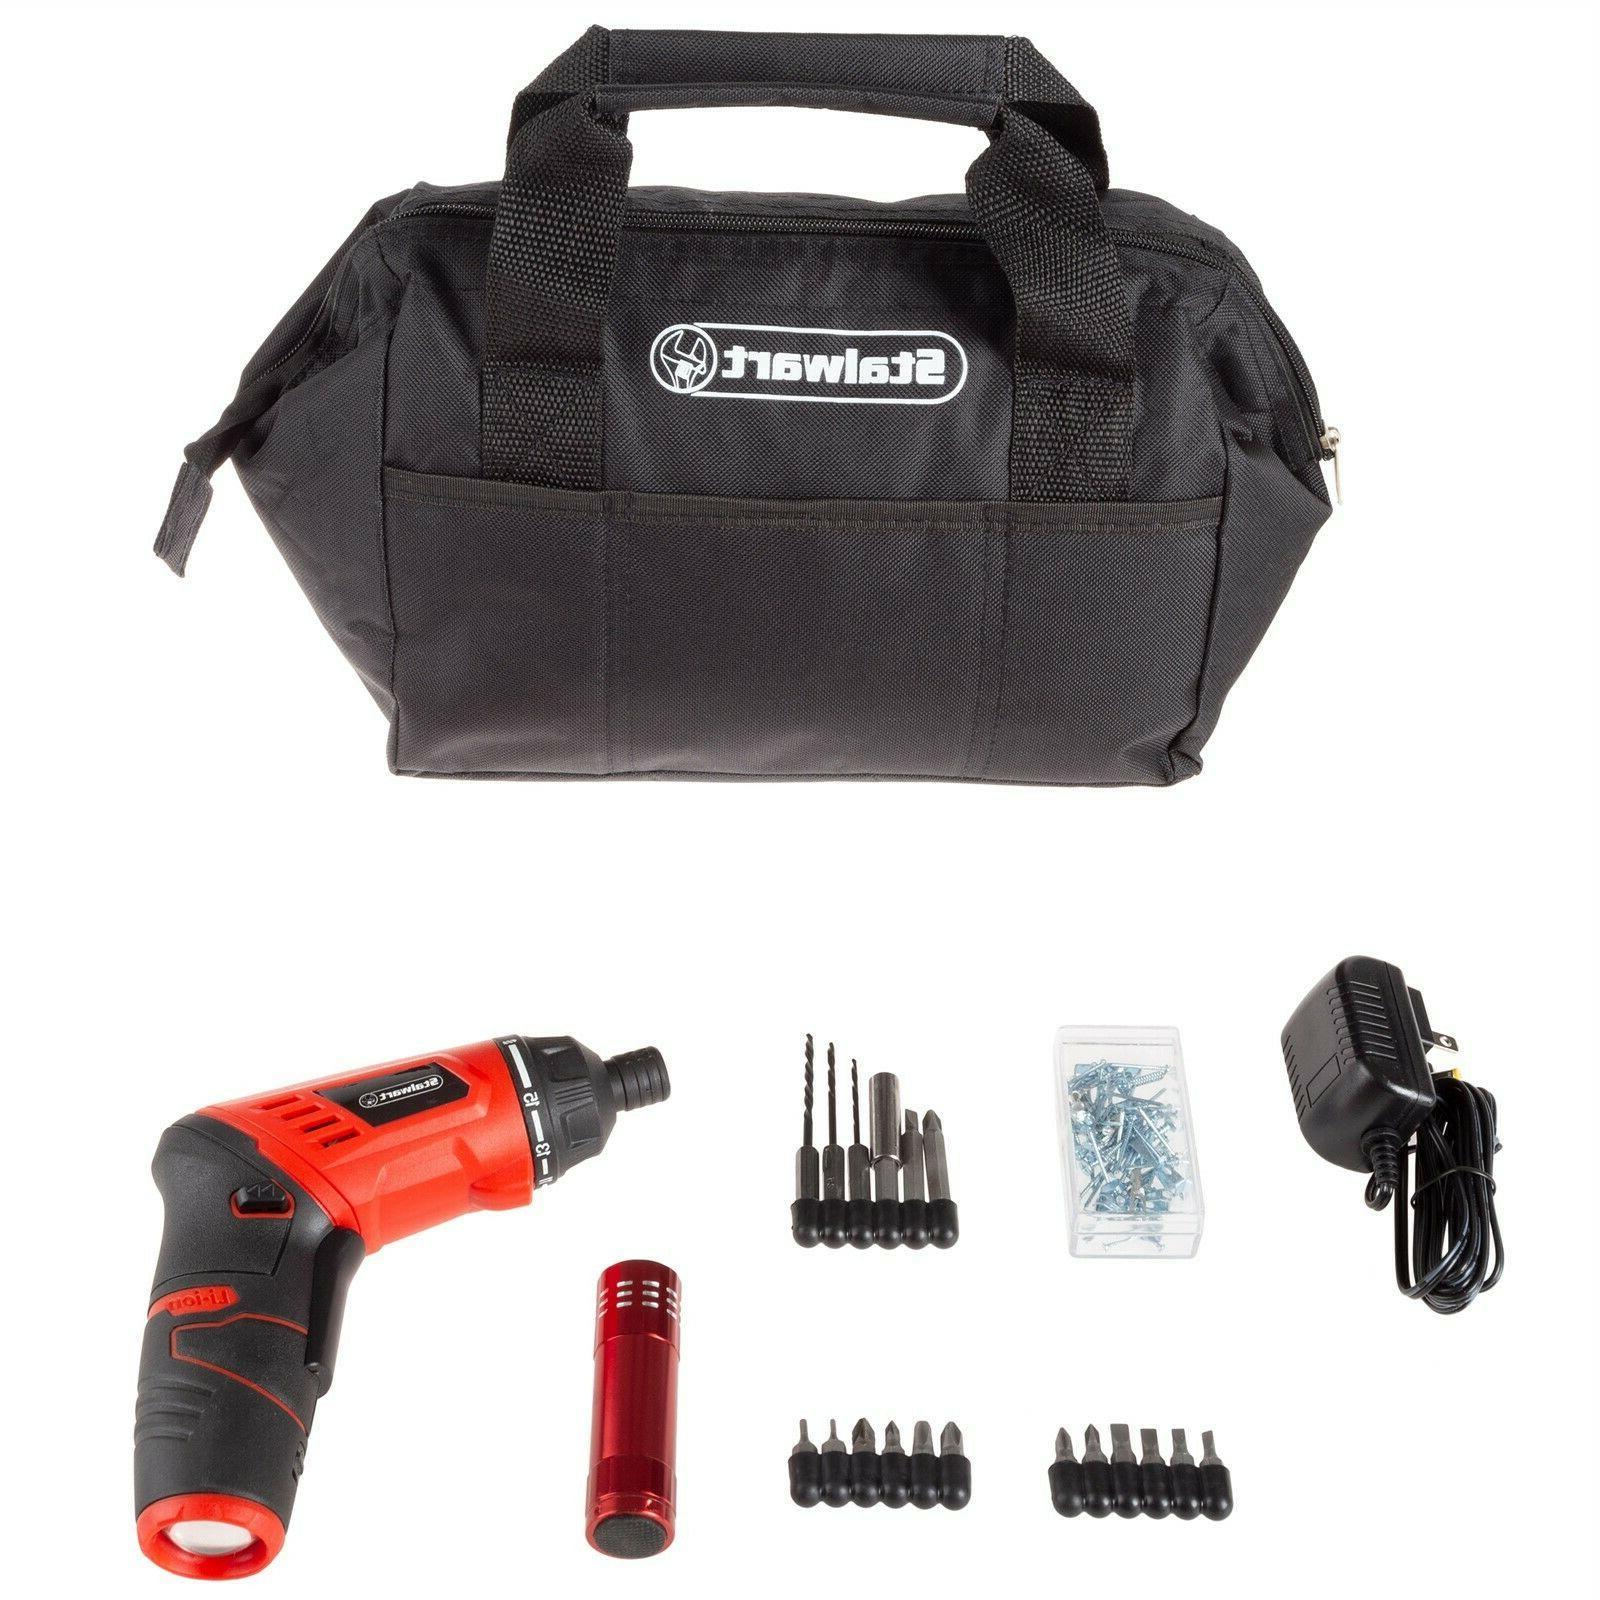 3 6v cordless screwdriver set tool bag